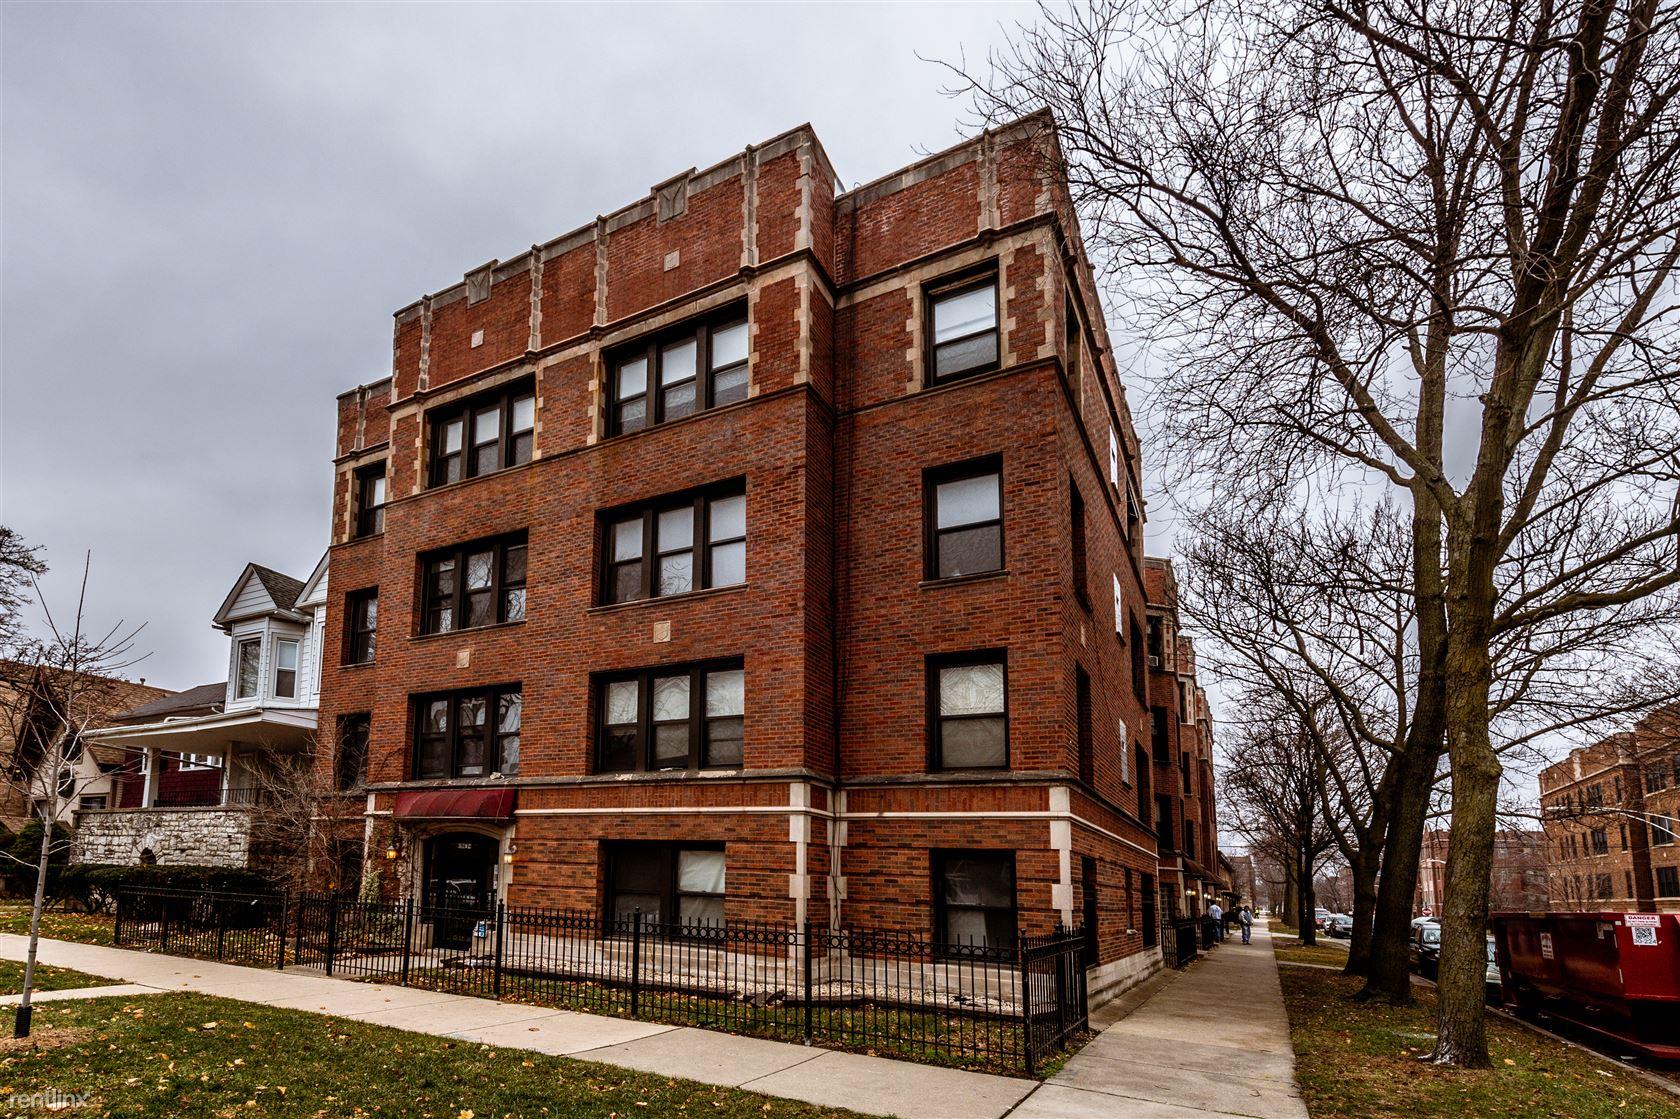 6904 S Cregier Ave, Chicago, IL - 600 USD/ month